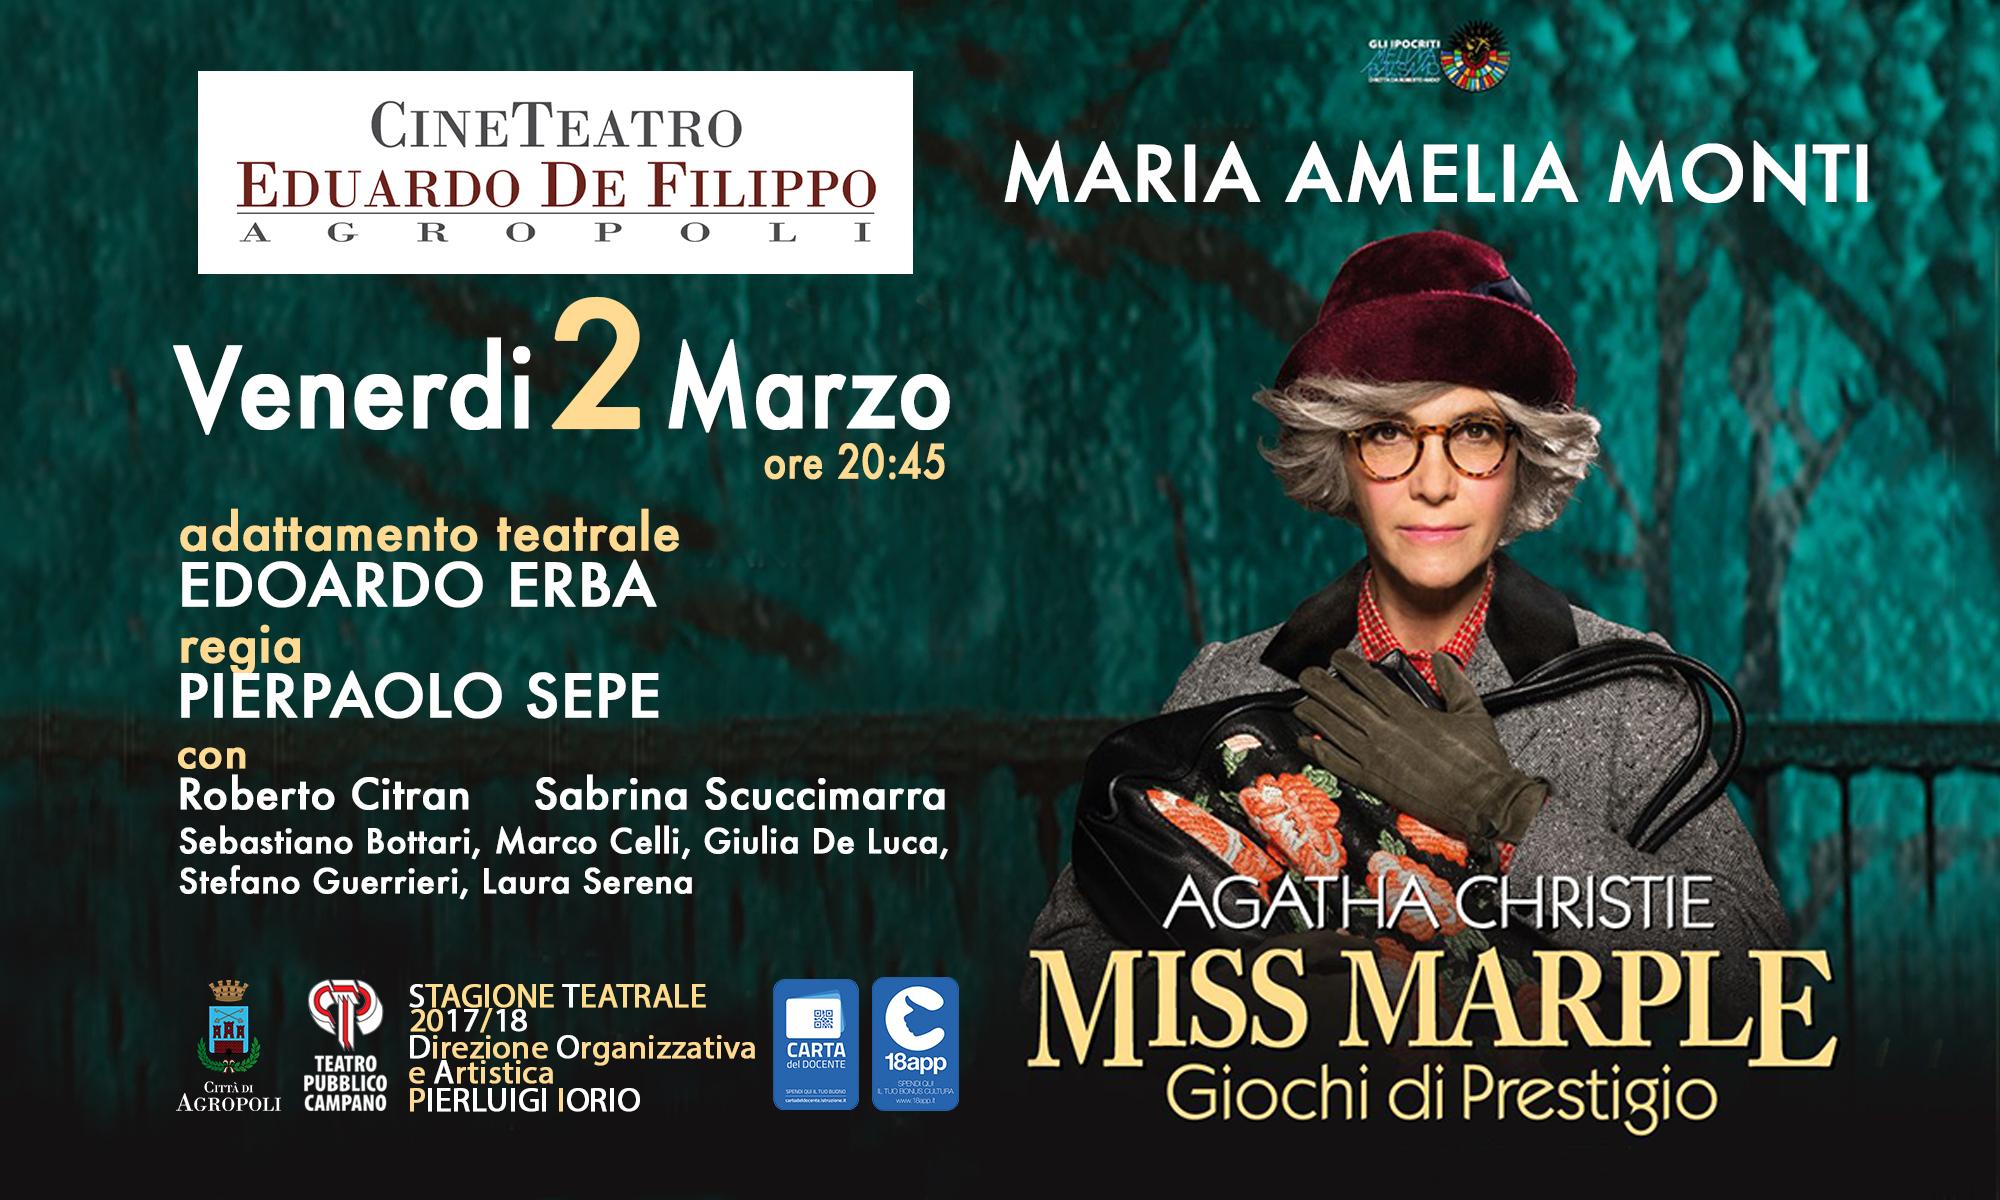 Maria Amelia Monti è Miss Marple